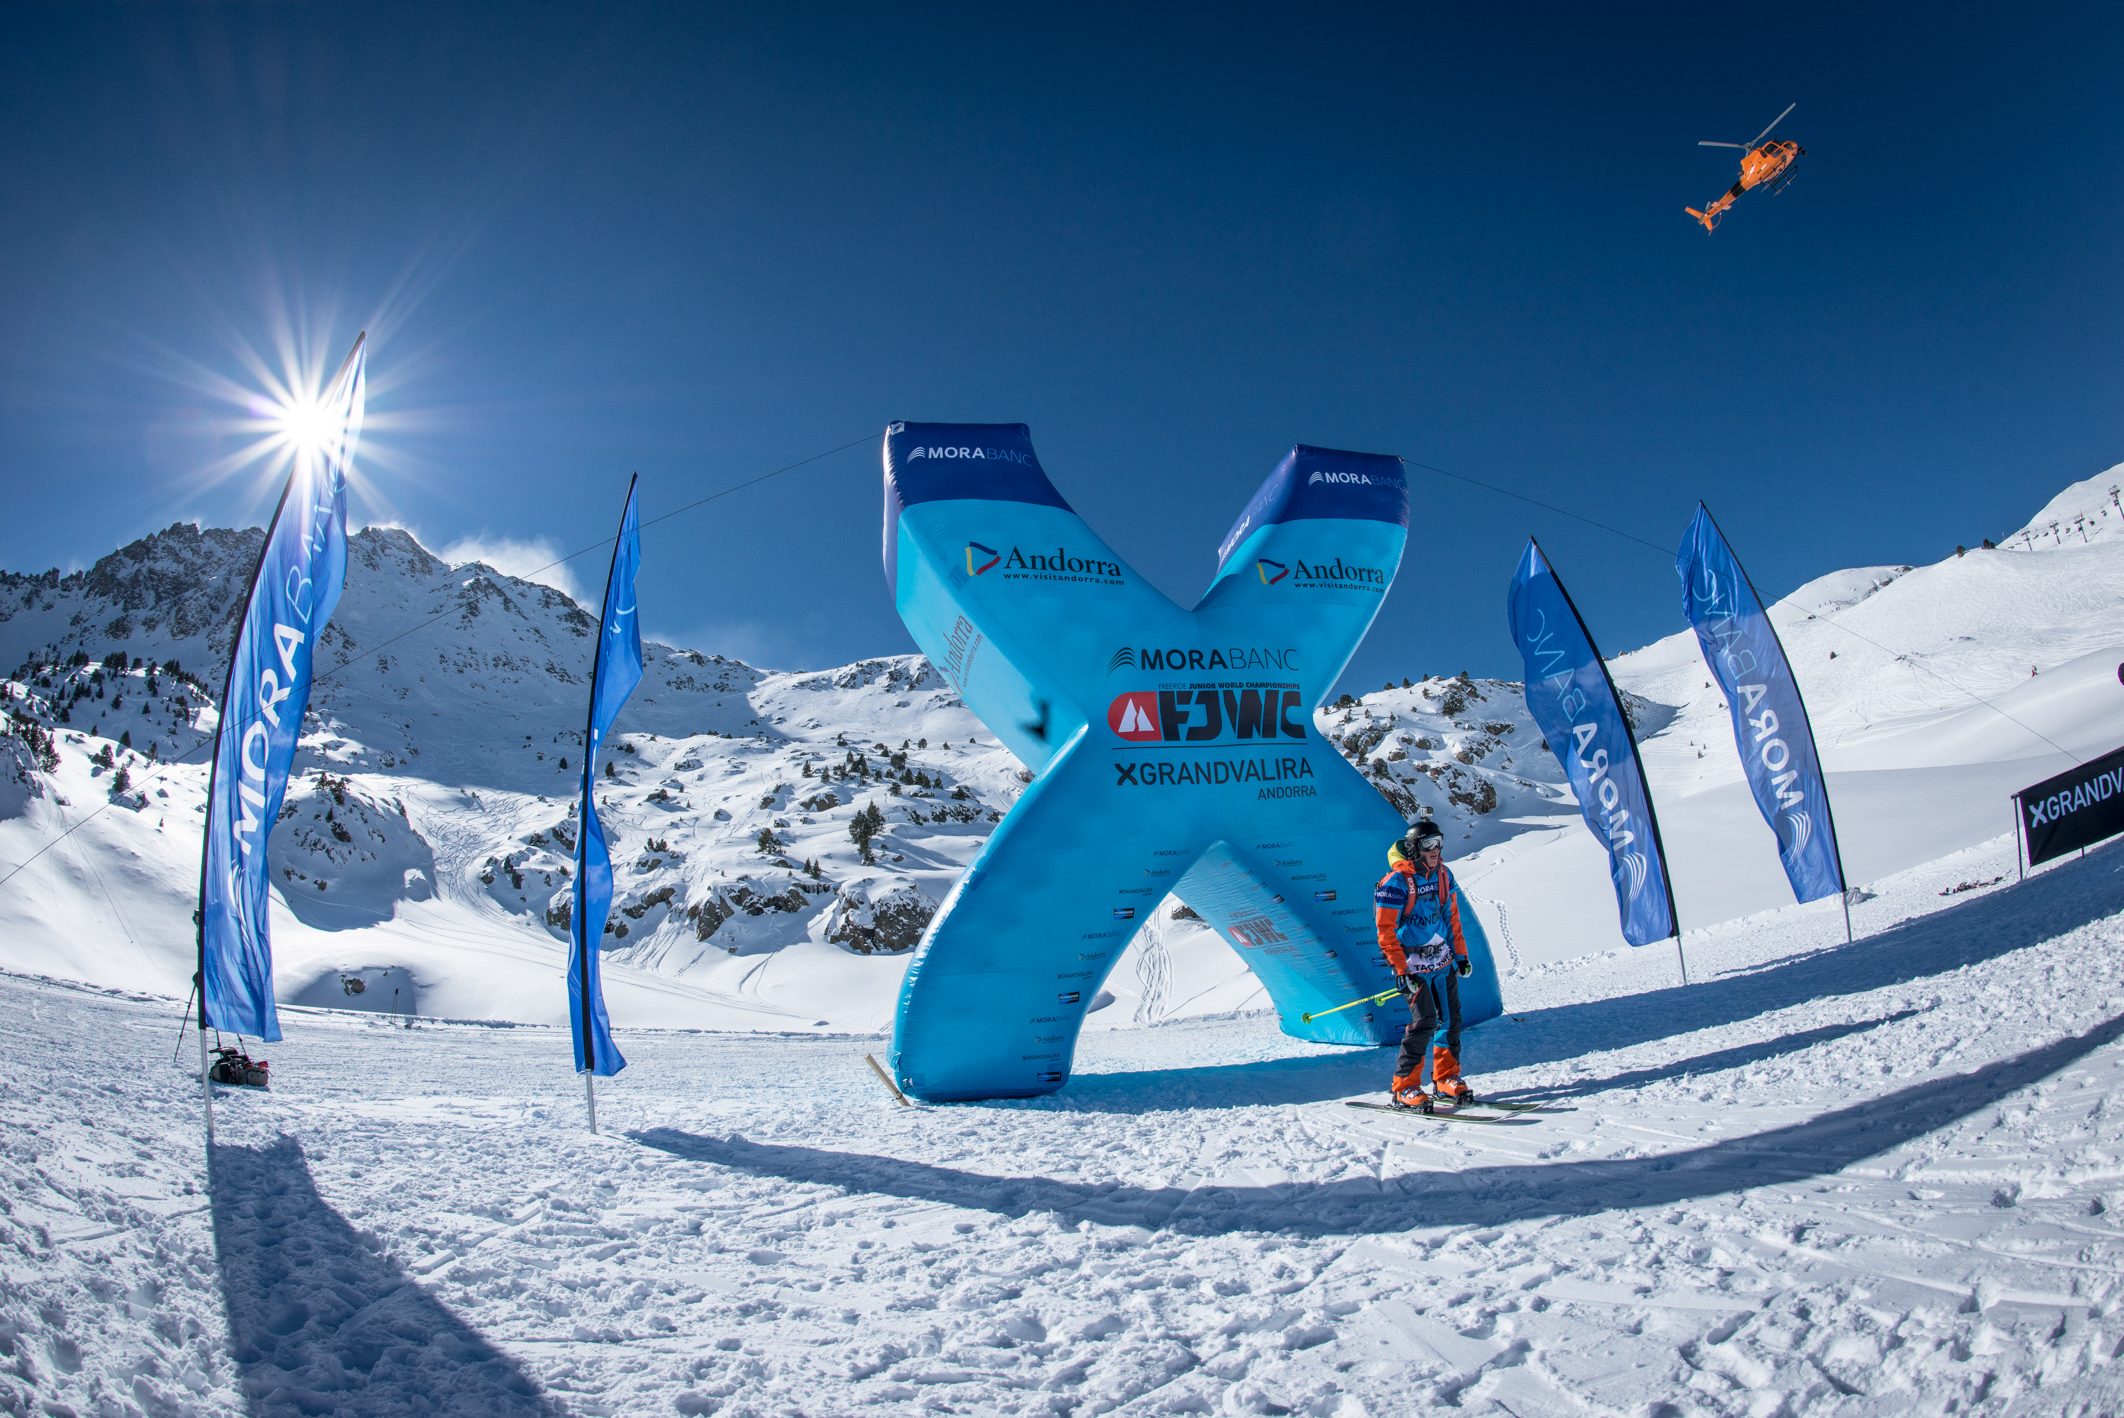 Freeride-Juniorenweltmeisterschaft 2016 in Grandvalira (Andorra) - Foto: : freerideworldtour.com / David Carlier